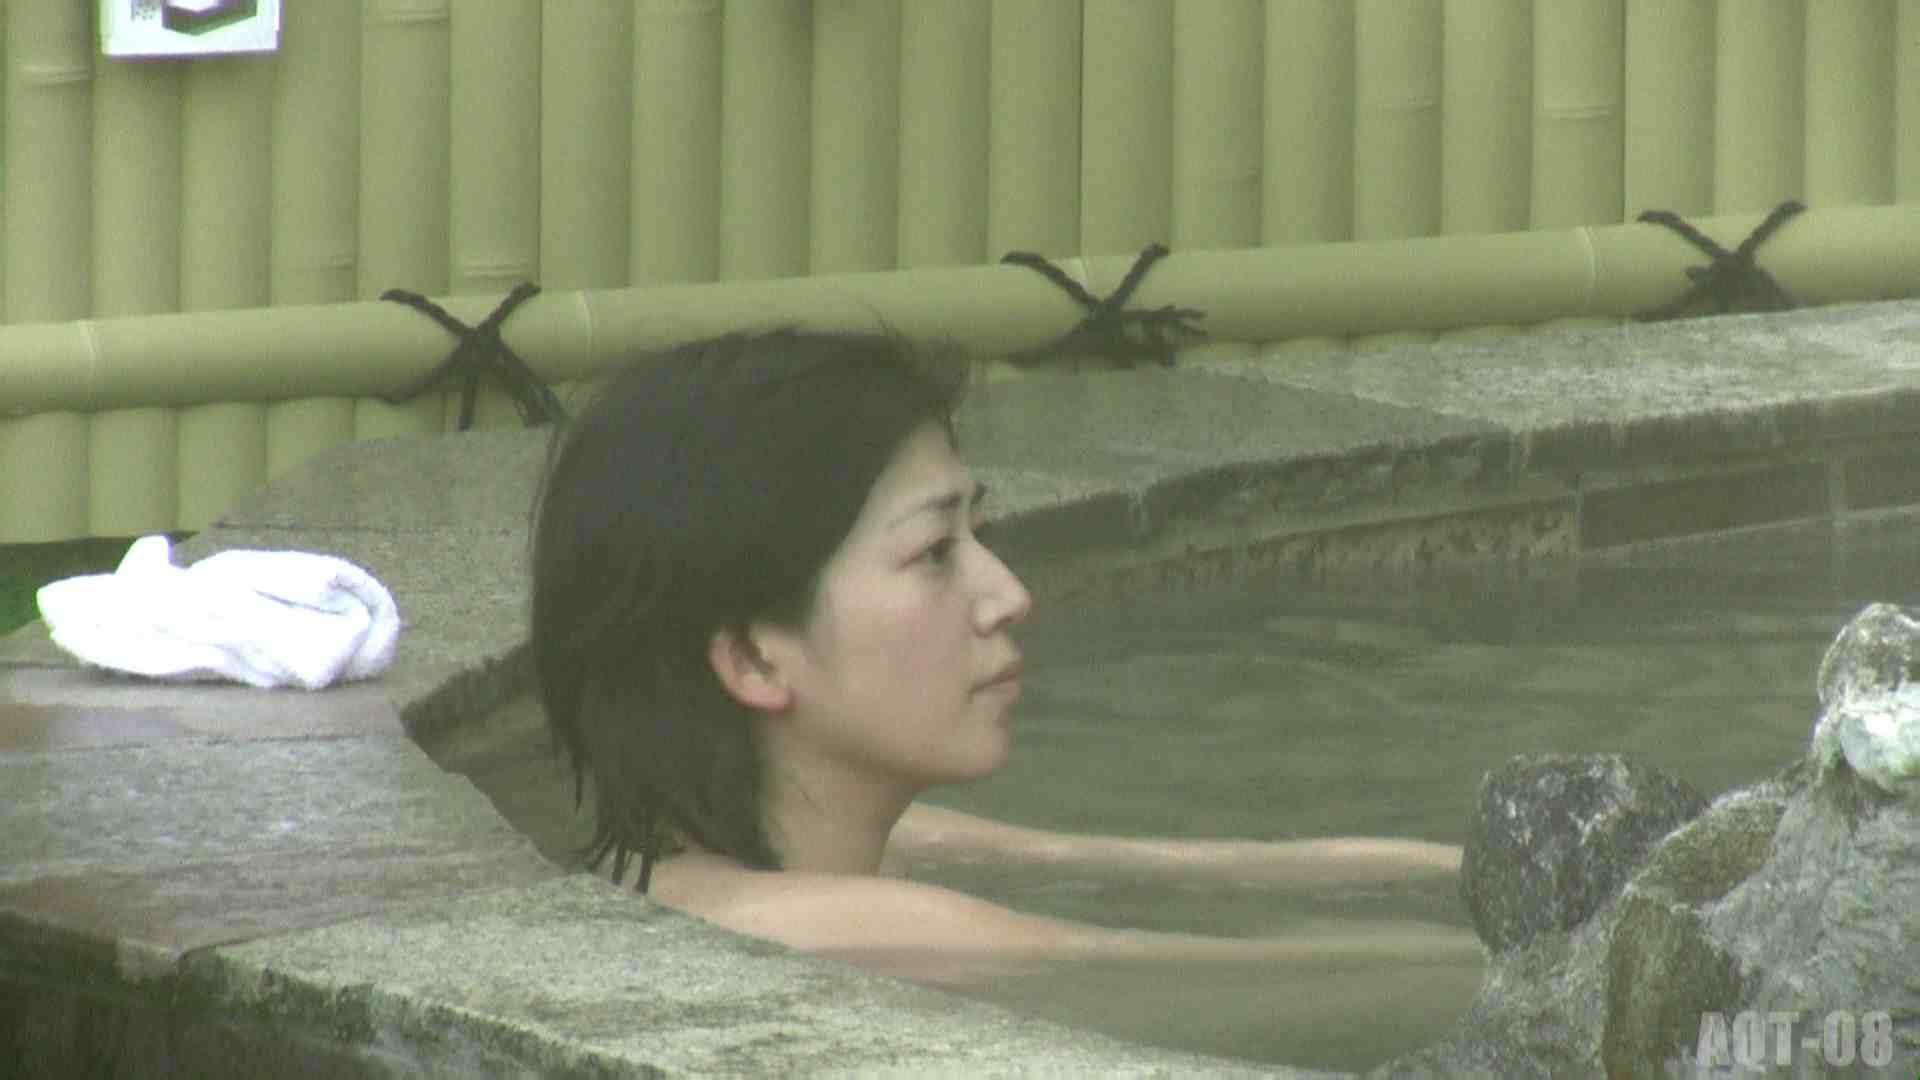 Aquaな露天風呂Vol.776 盗撮 | HなOL  60pic 55